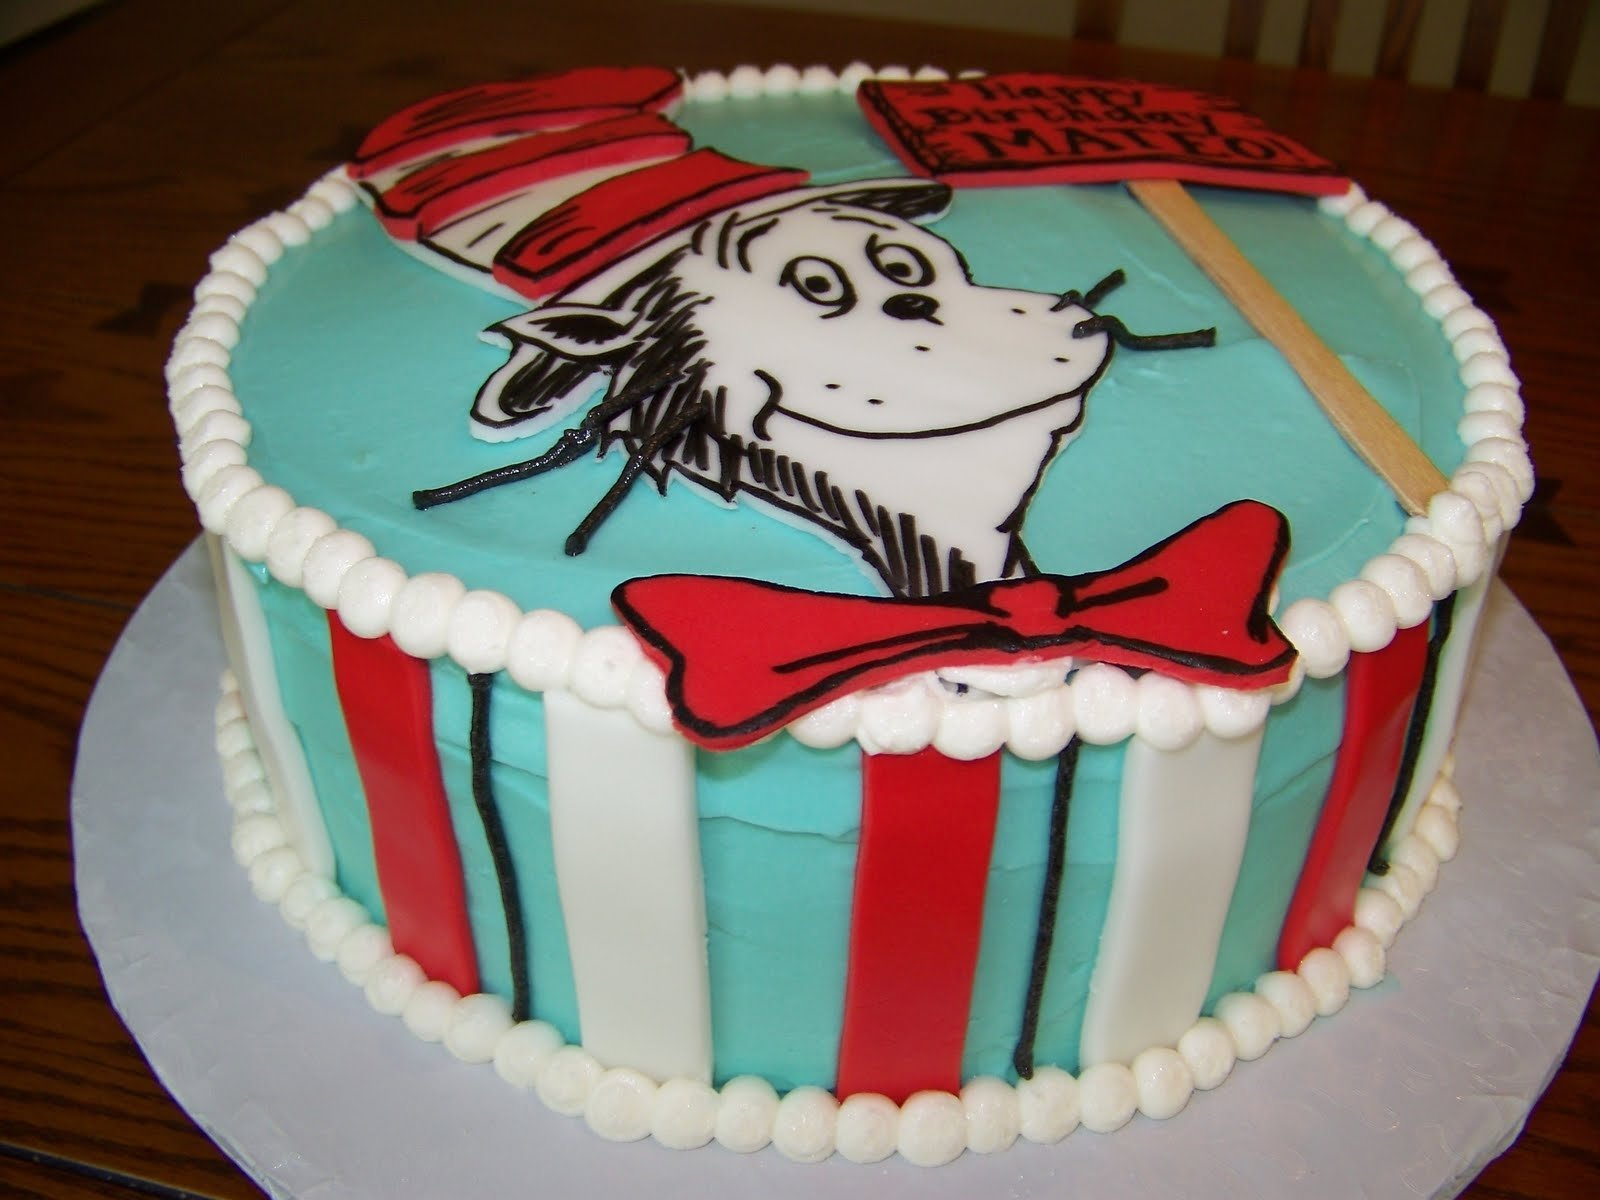 10 Attractive Cat In The Hat Cake Ideas cat in the hat birthday cakes plumeria cake studio dr seuss cat 2020